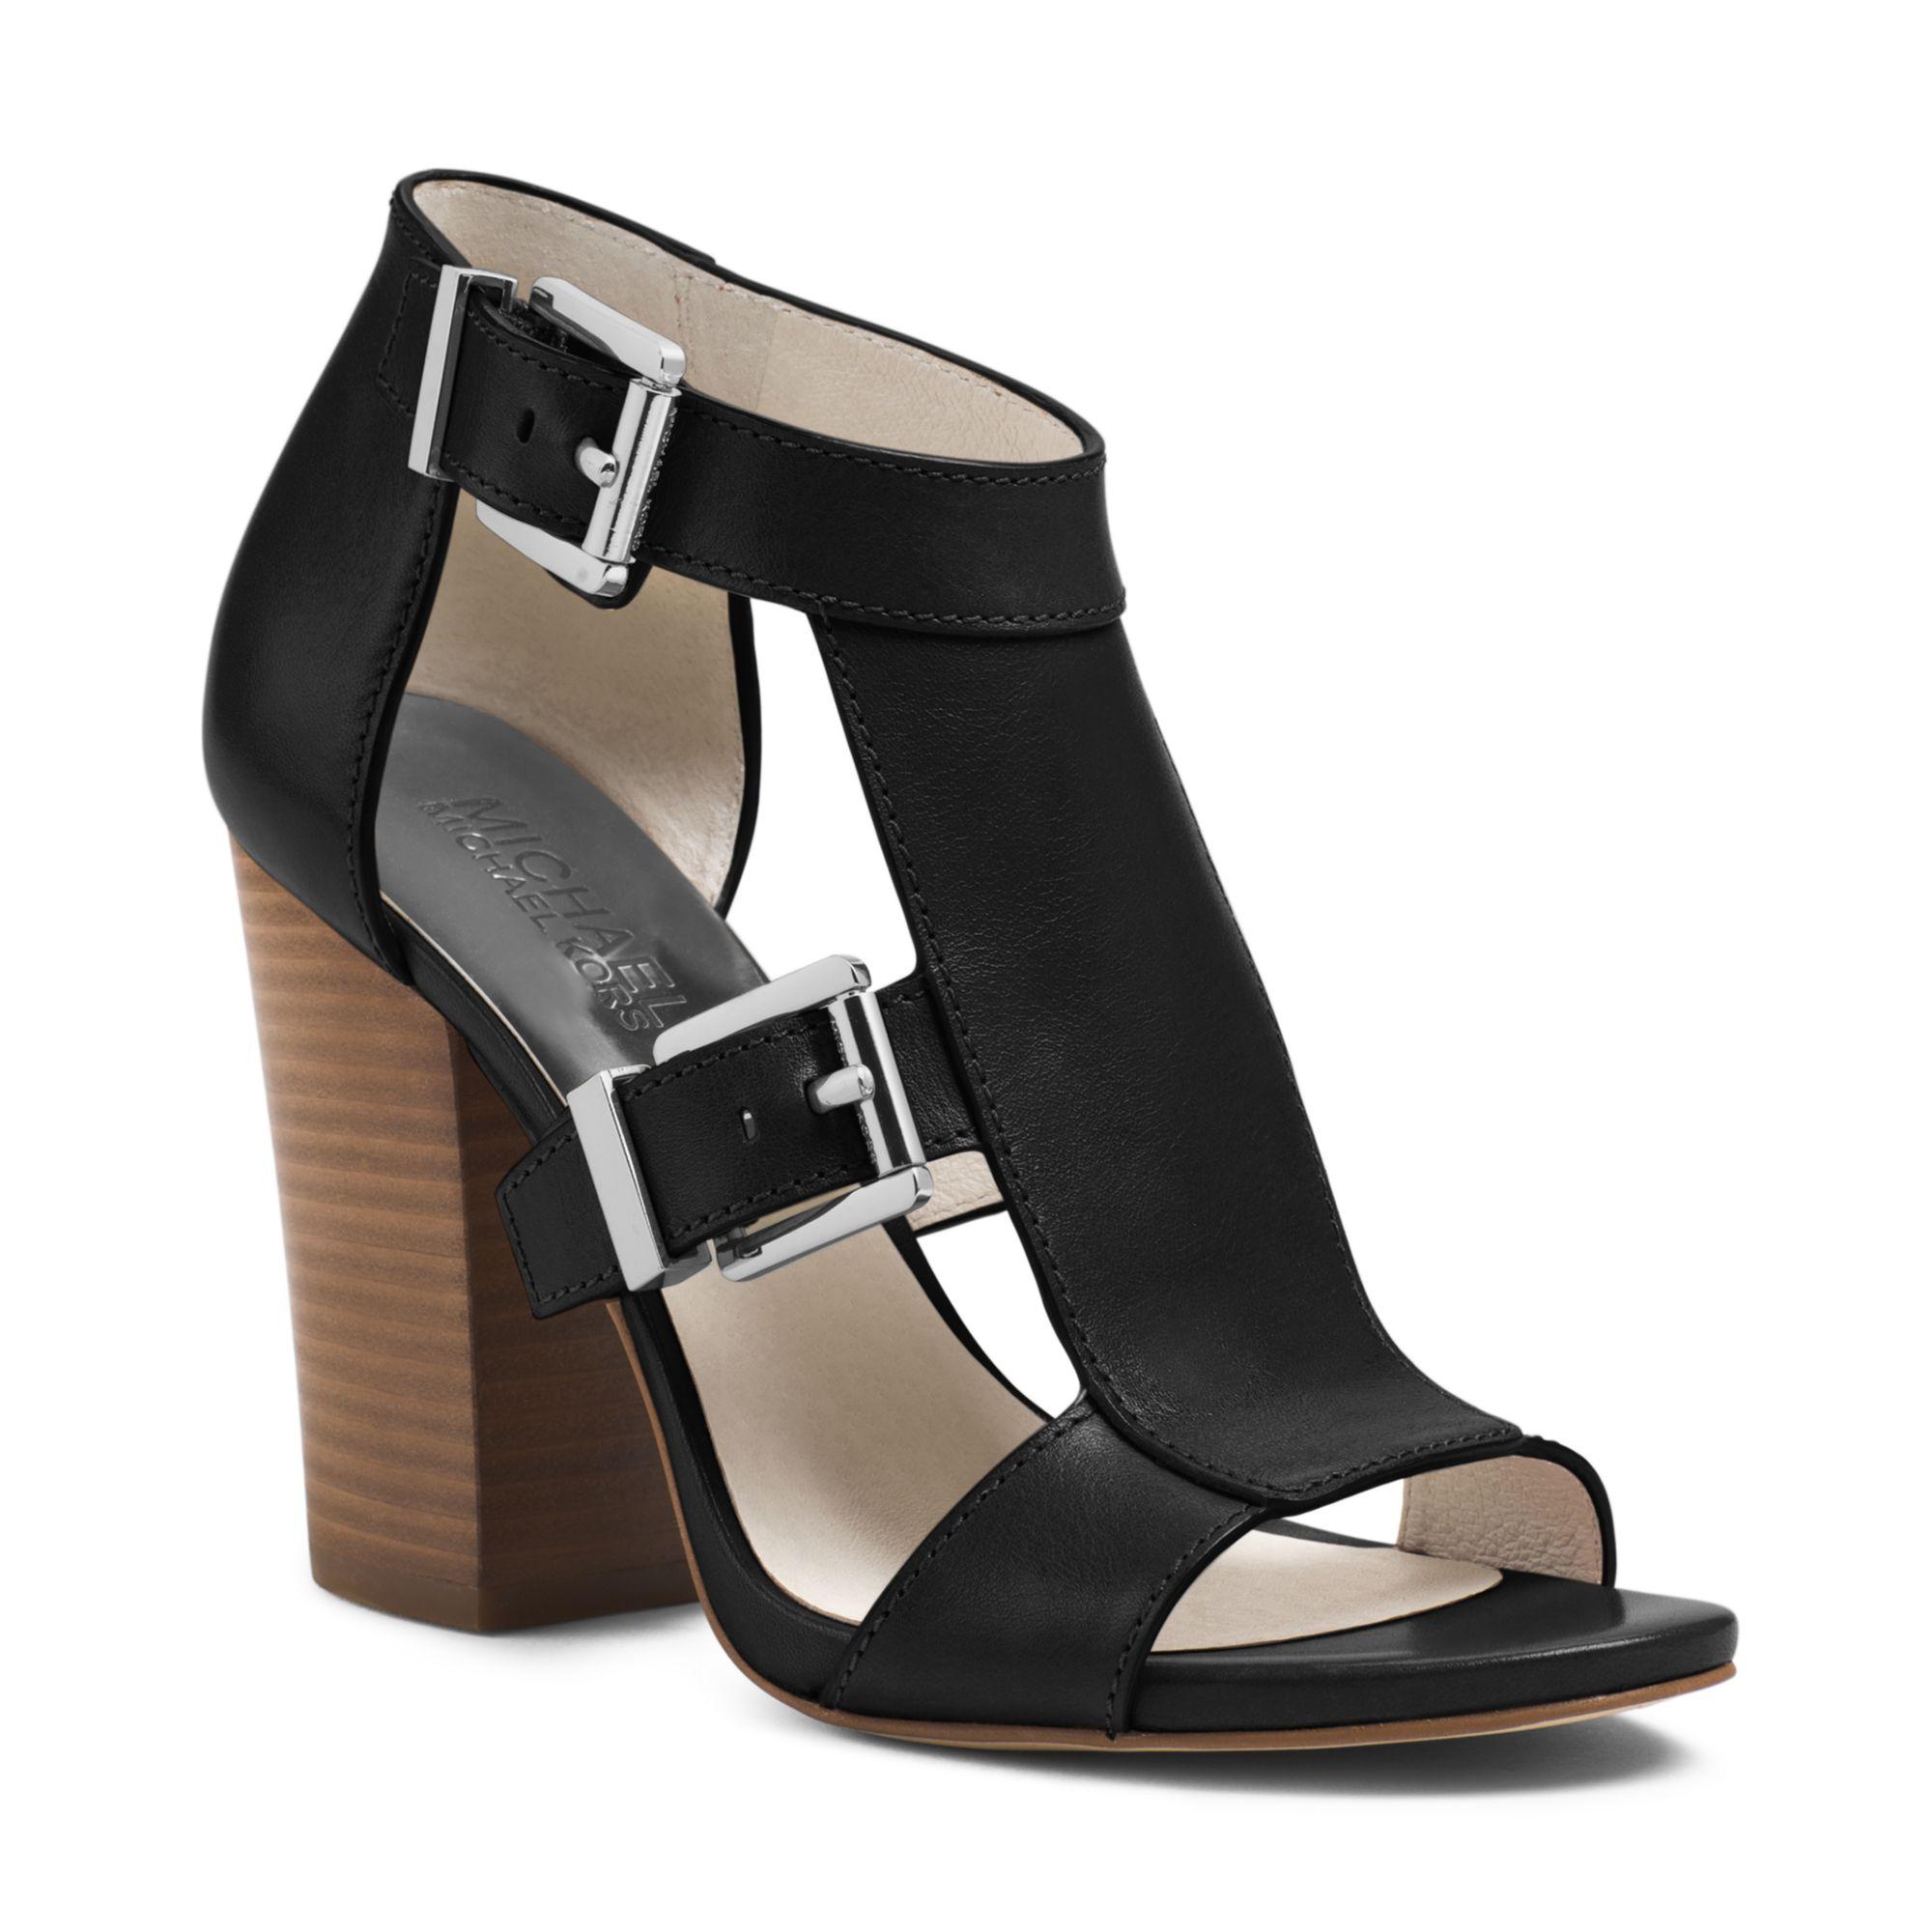 Michael Kors Michael Robin T Strap Wedge Sandals In Black